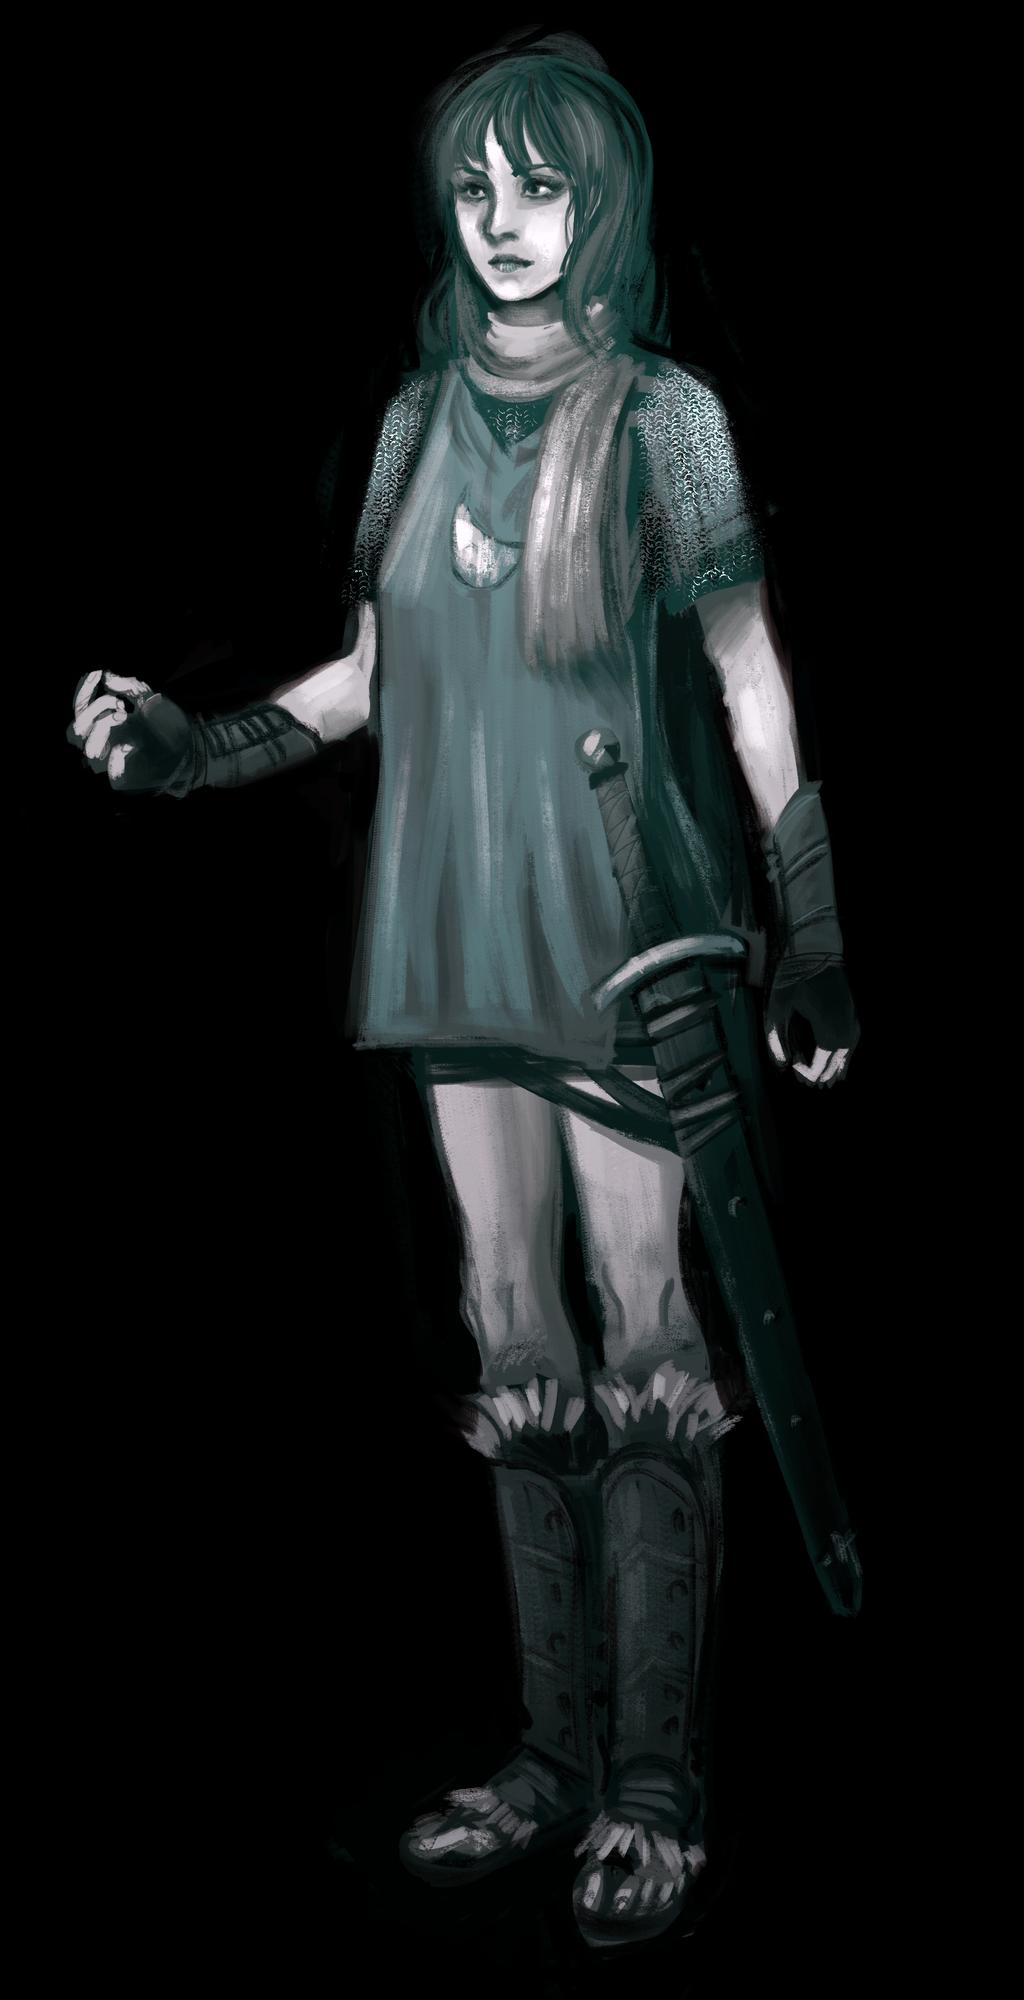 http://fc02.deviantart.net/fs70/i/2013/331/7/c/female_soldier_by_sakamu-d6vt1wq.png